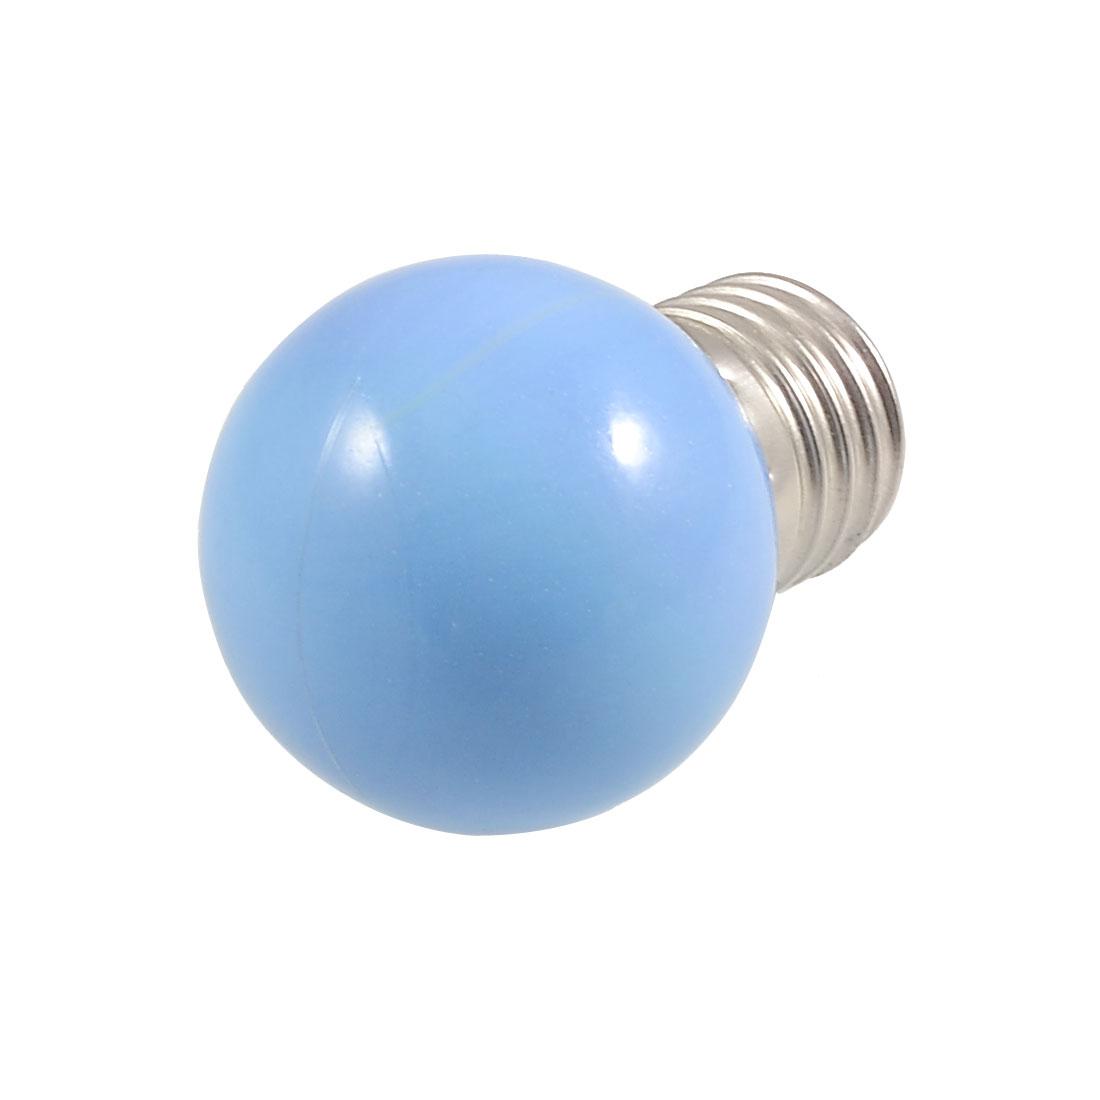 Bedrooms Blue Light E27 Screw Base LED Bulb Lamp AC 110-250V 1/3W